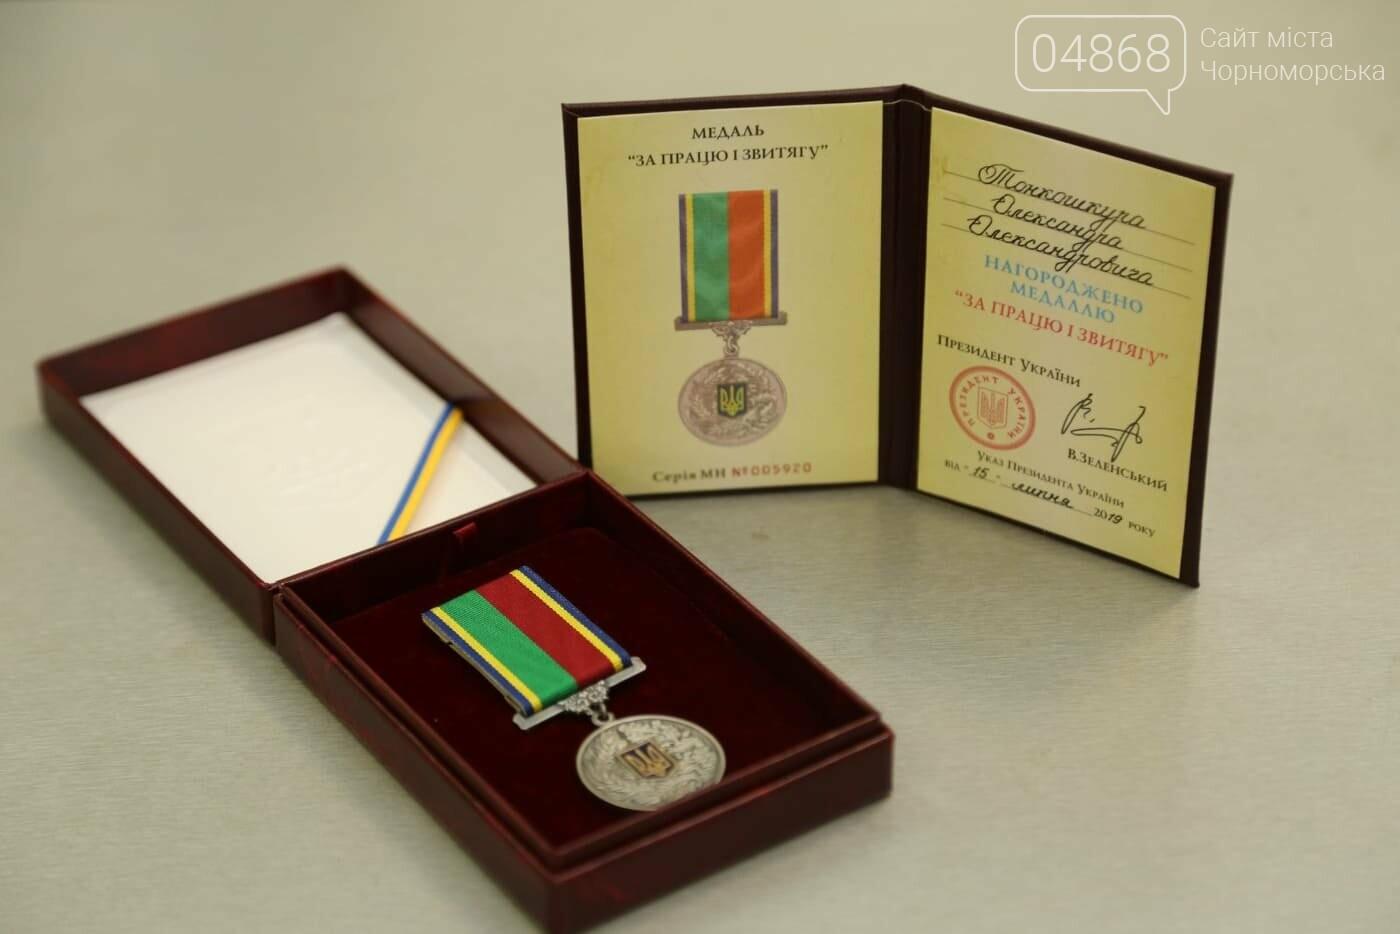 Каратистам из Черноморска вручили президентскую награду , фото-5